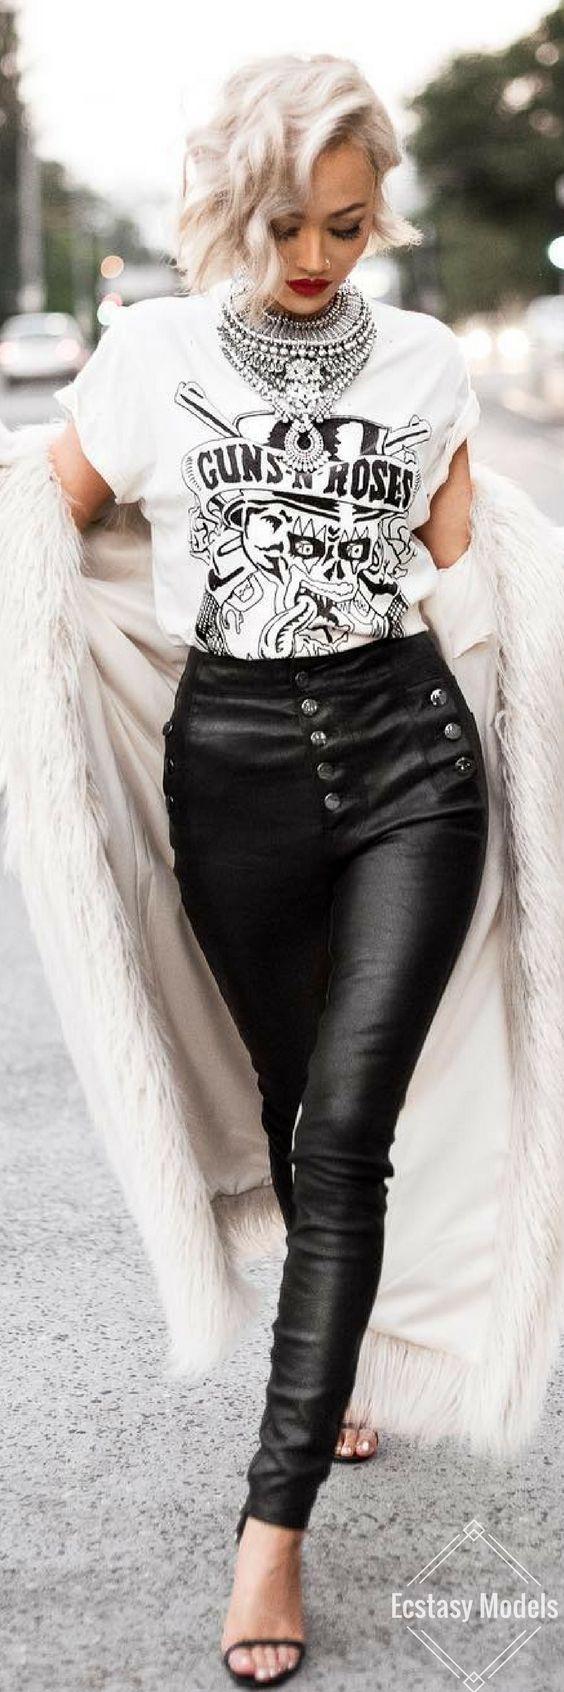 Rockstar // Fashion Look by Micah Gianneli: